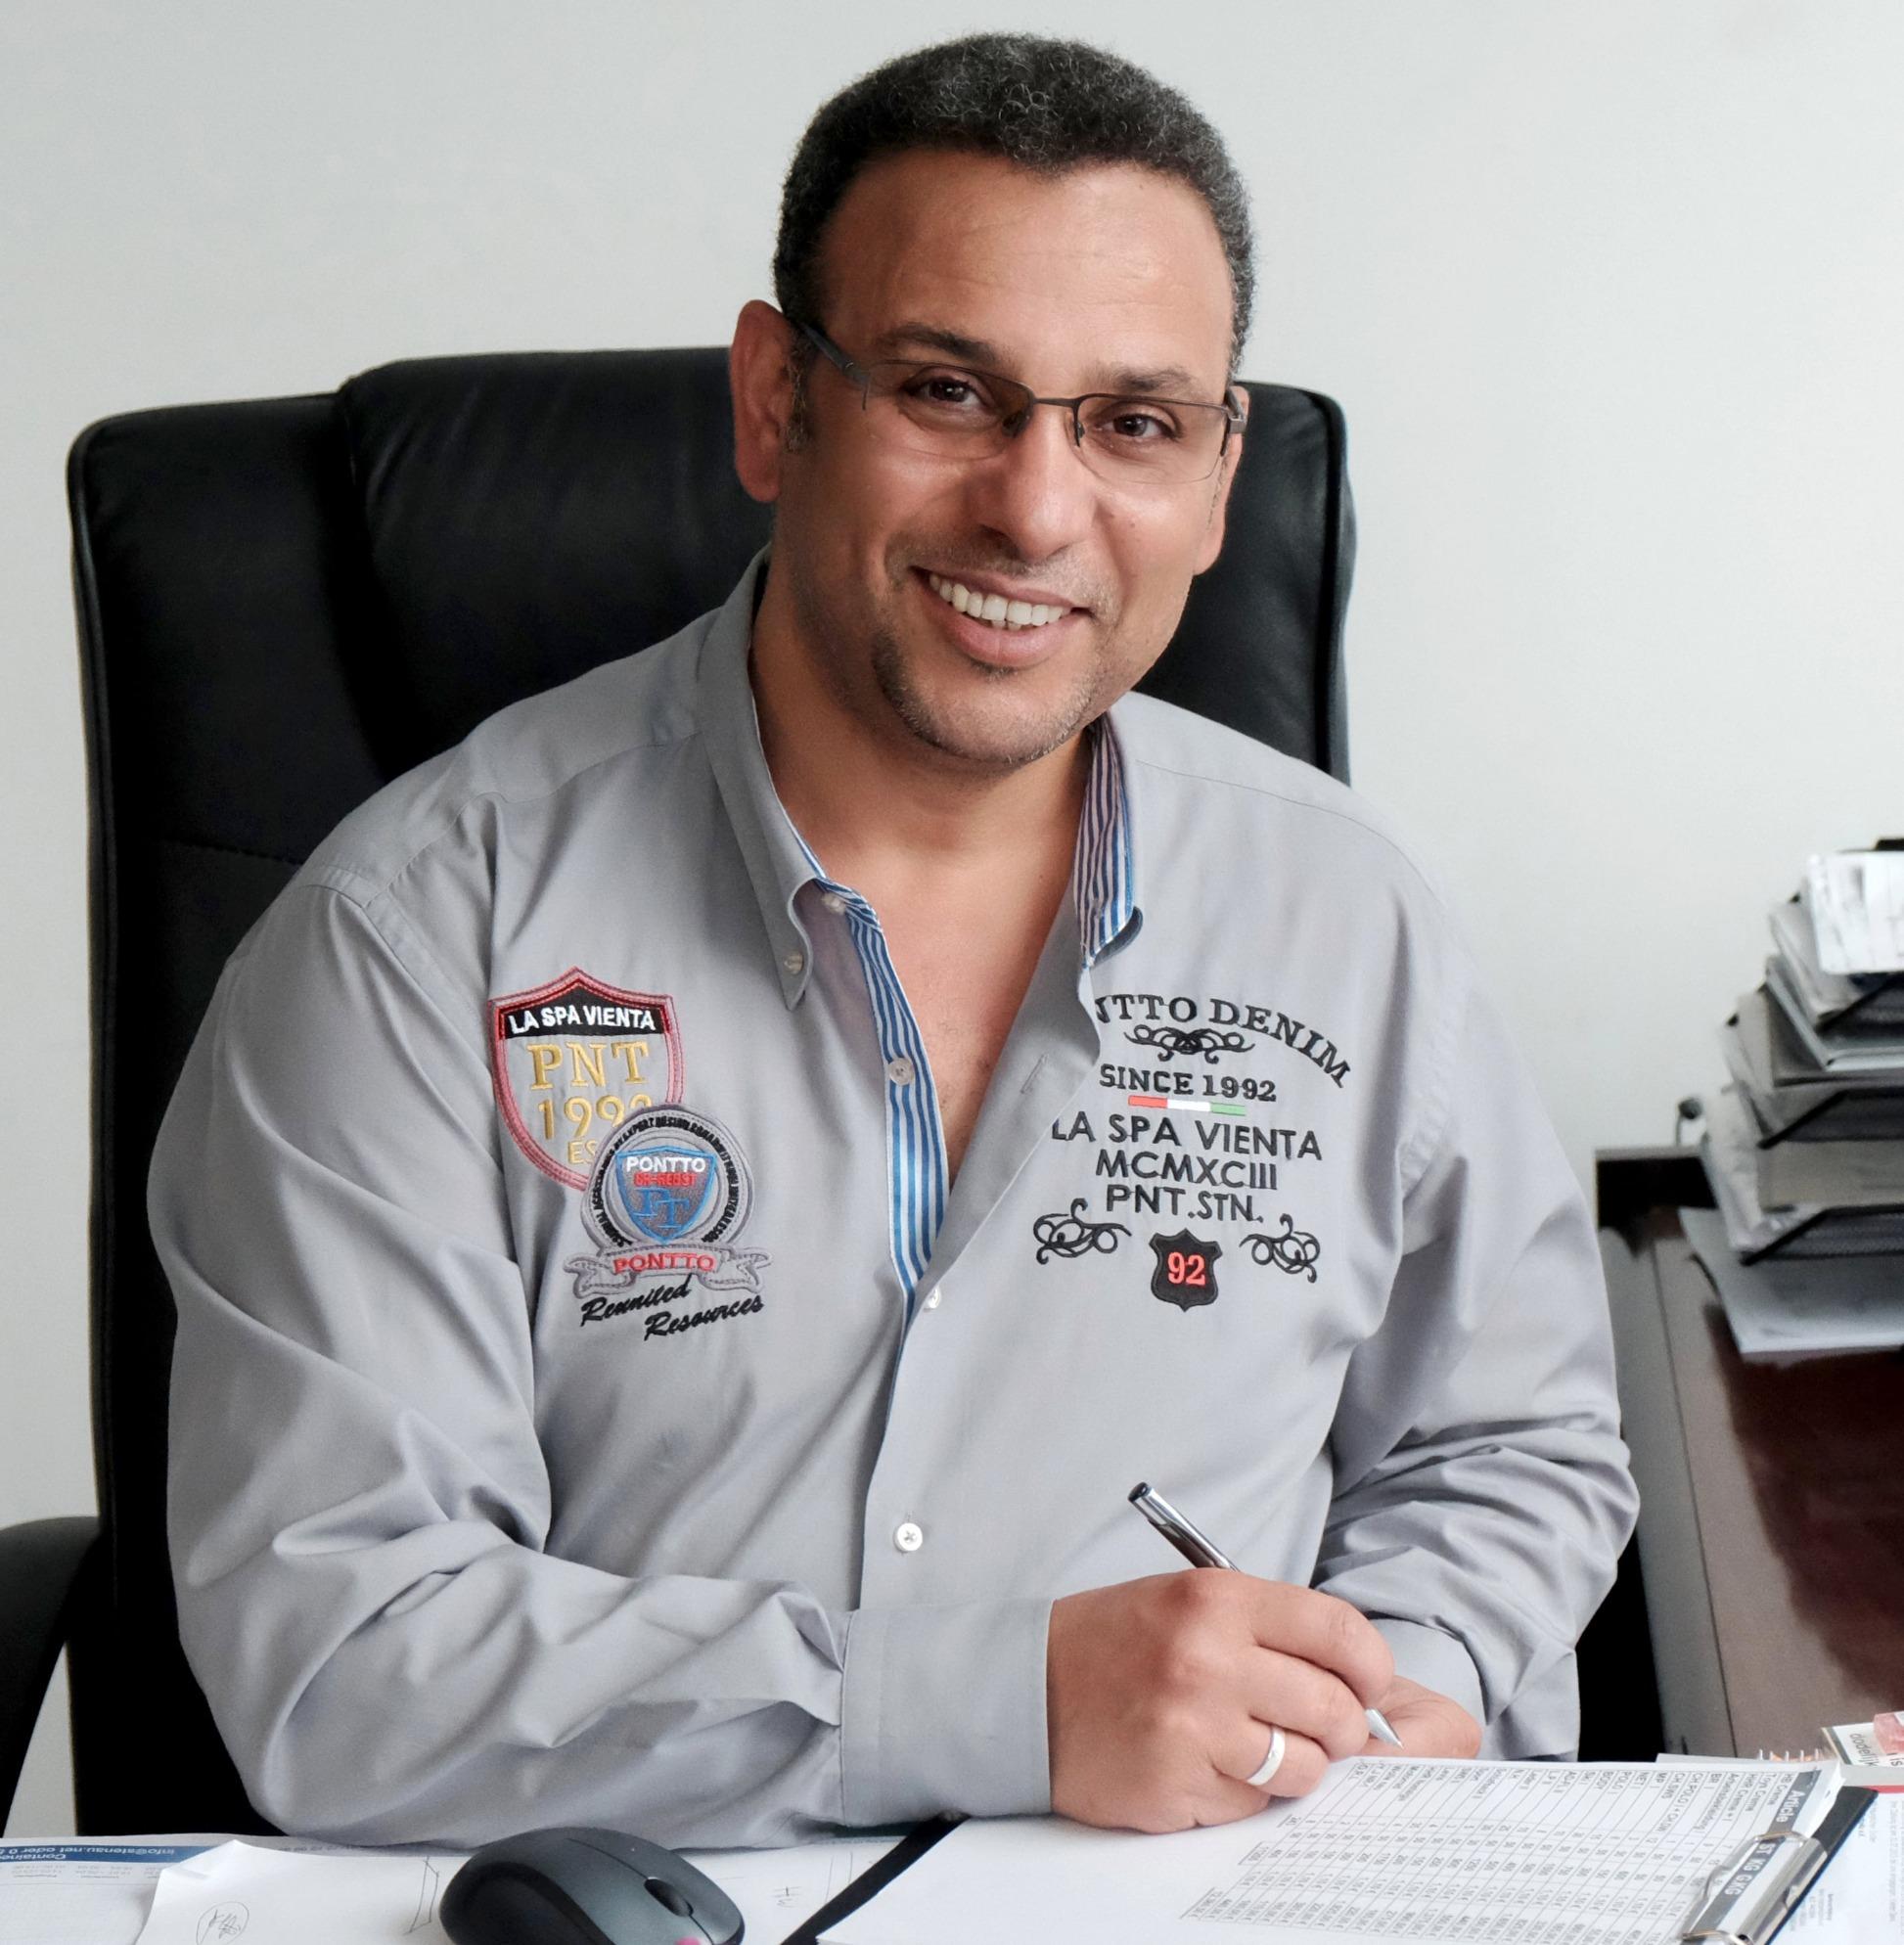 Mohammed Al Shoubaki